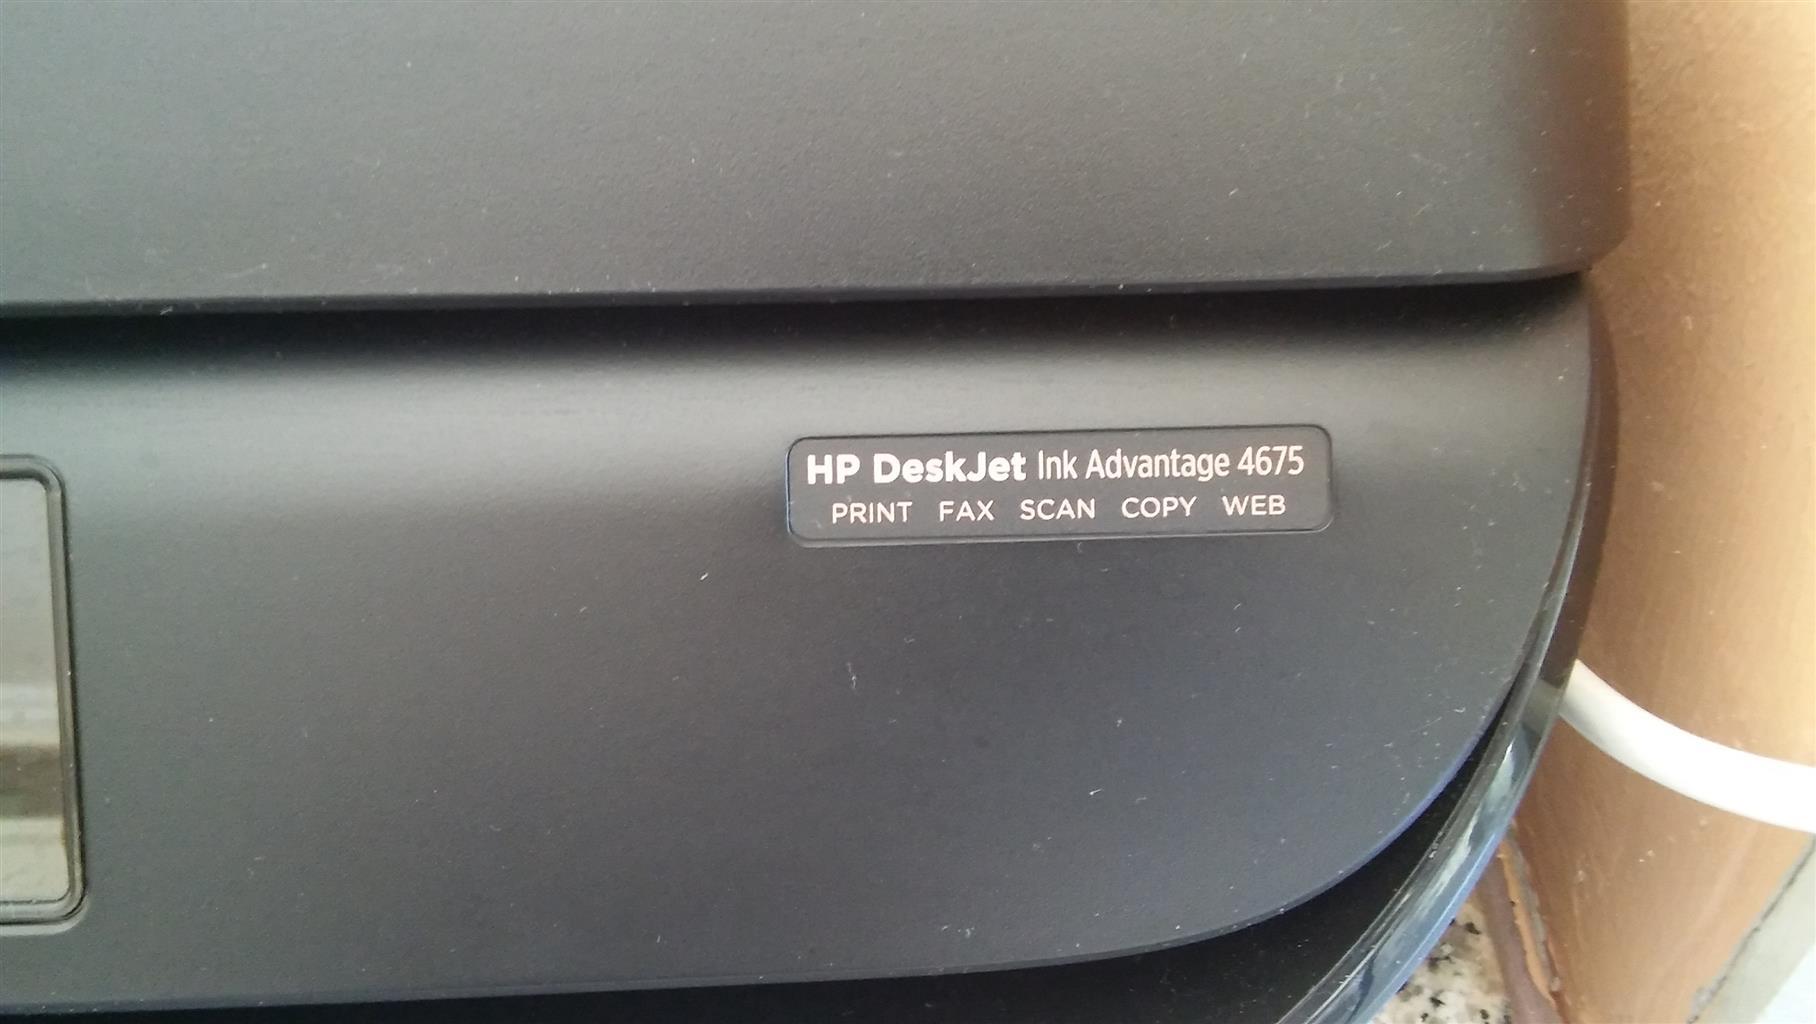 Hp Inkjet Advantage Junk Mail Printer Deskjet Ink 4675 All In One